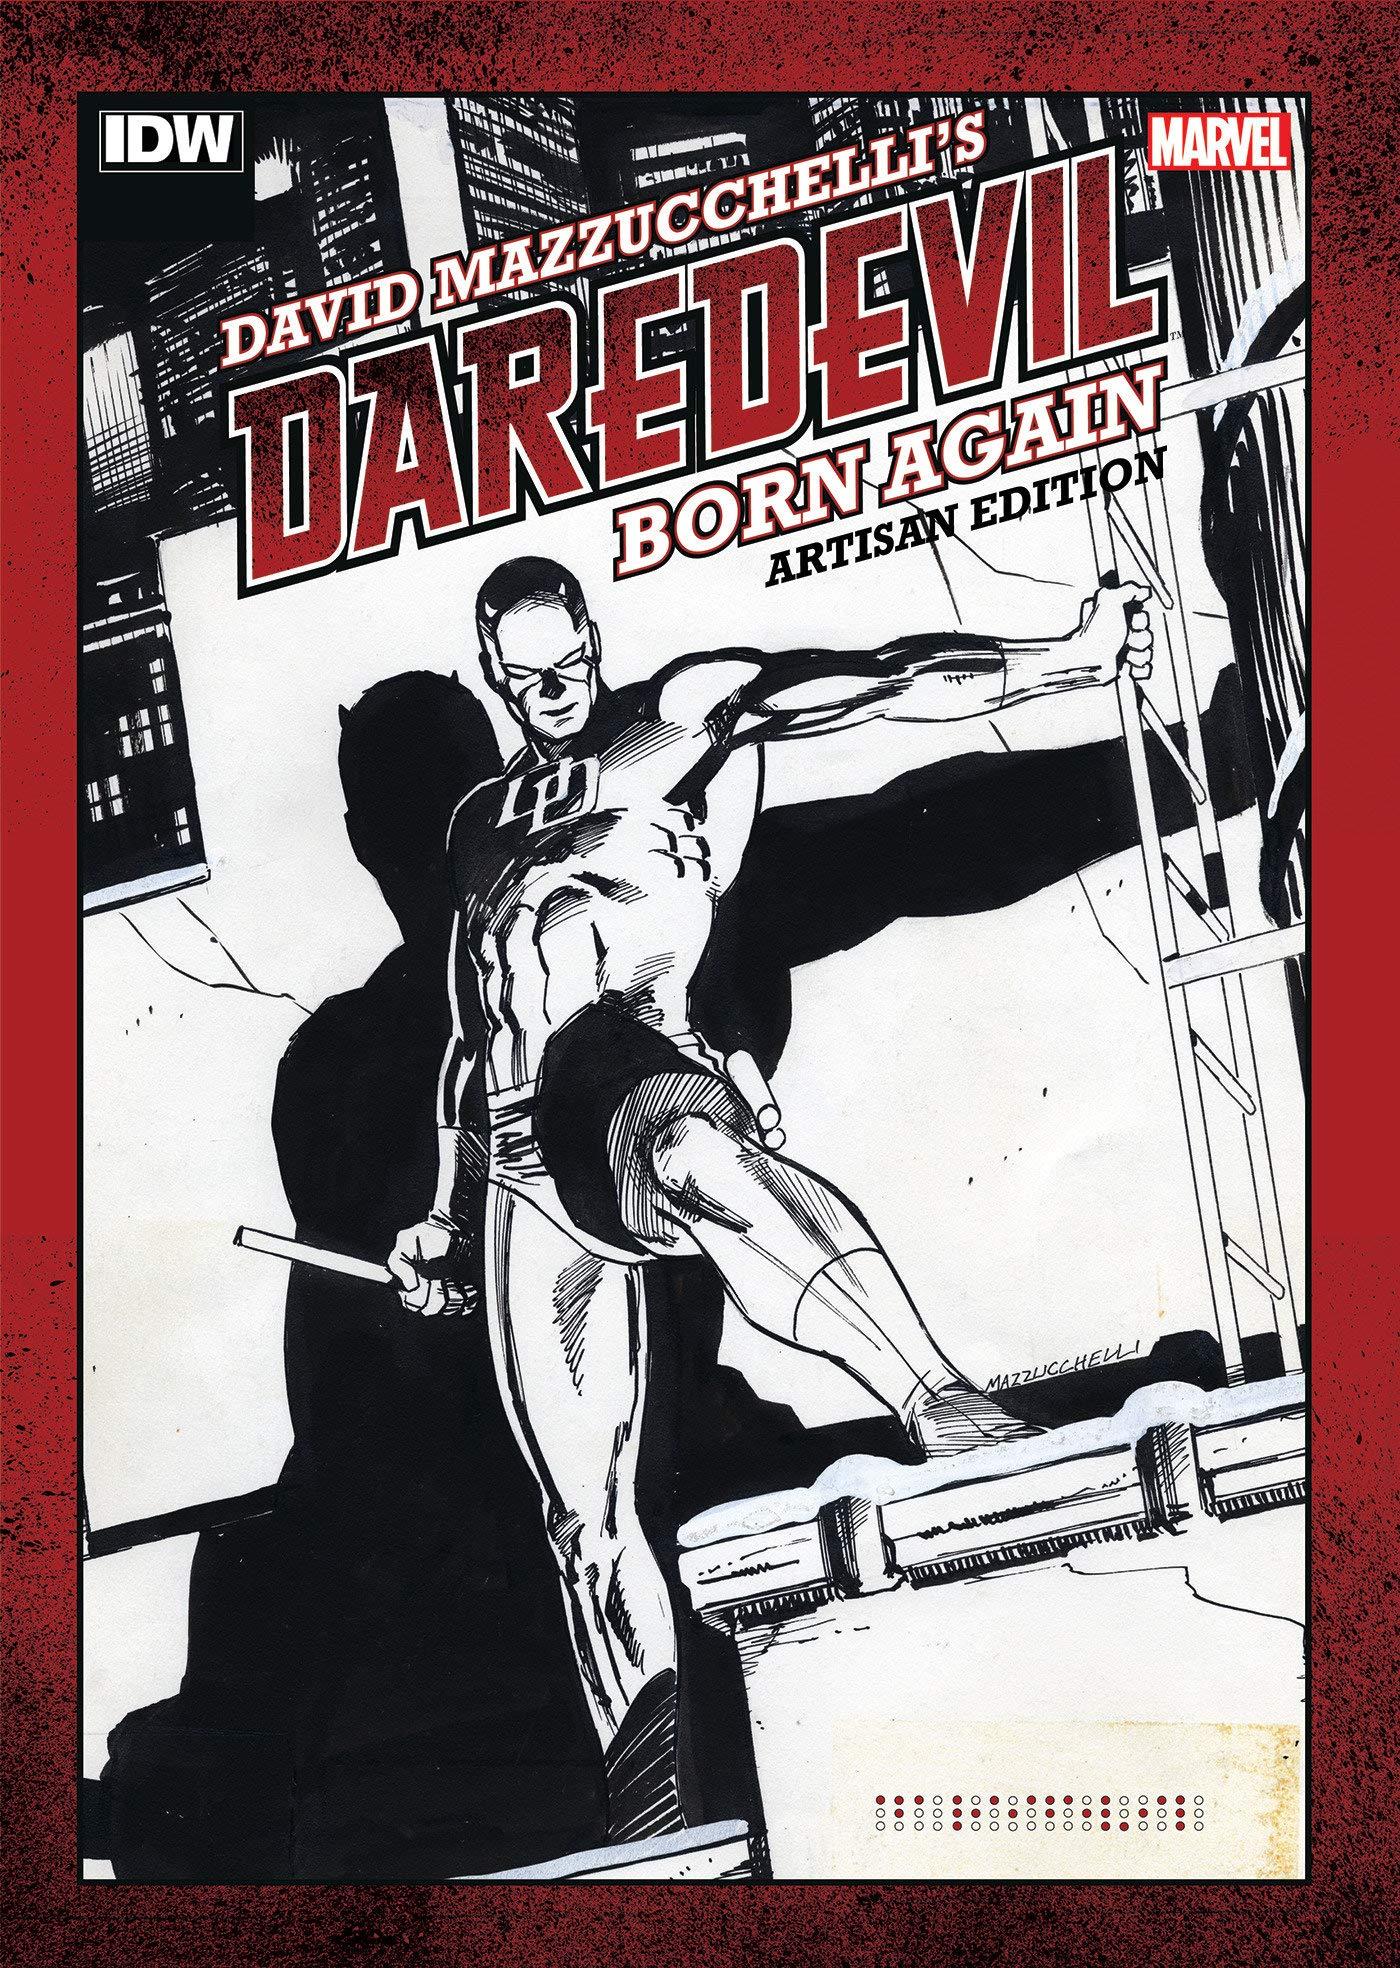 David Mazzucchelli's Daredevil Born Again Artisan Edition by IDW Publishing